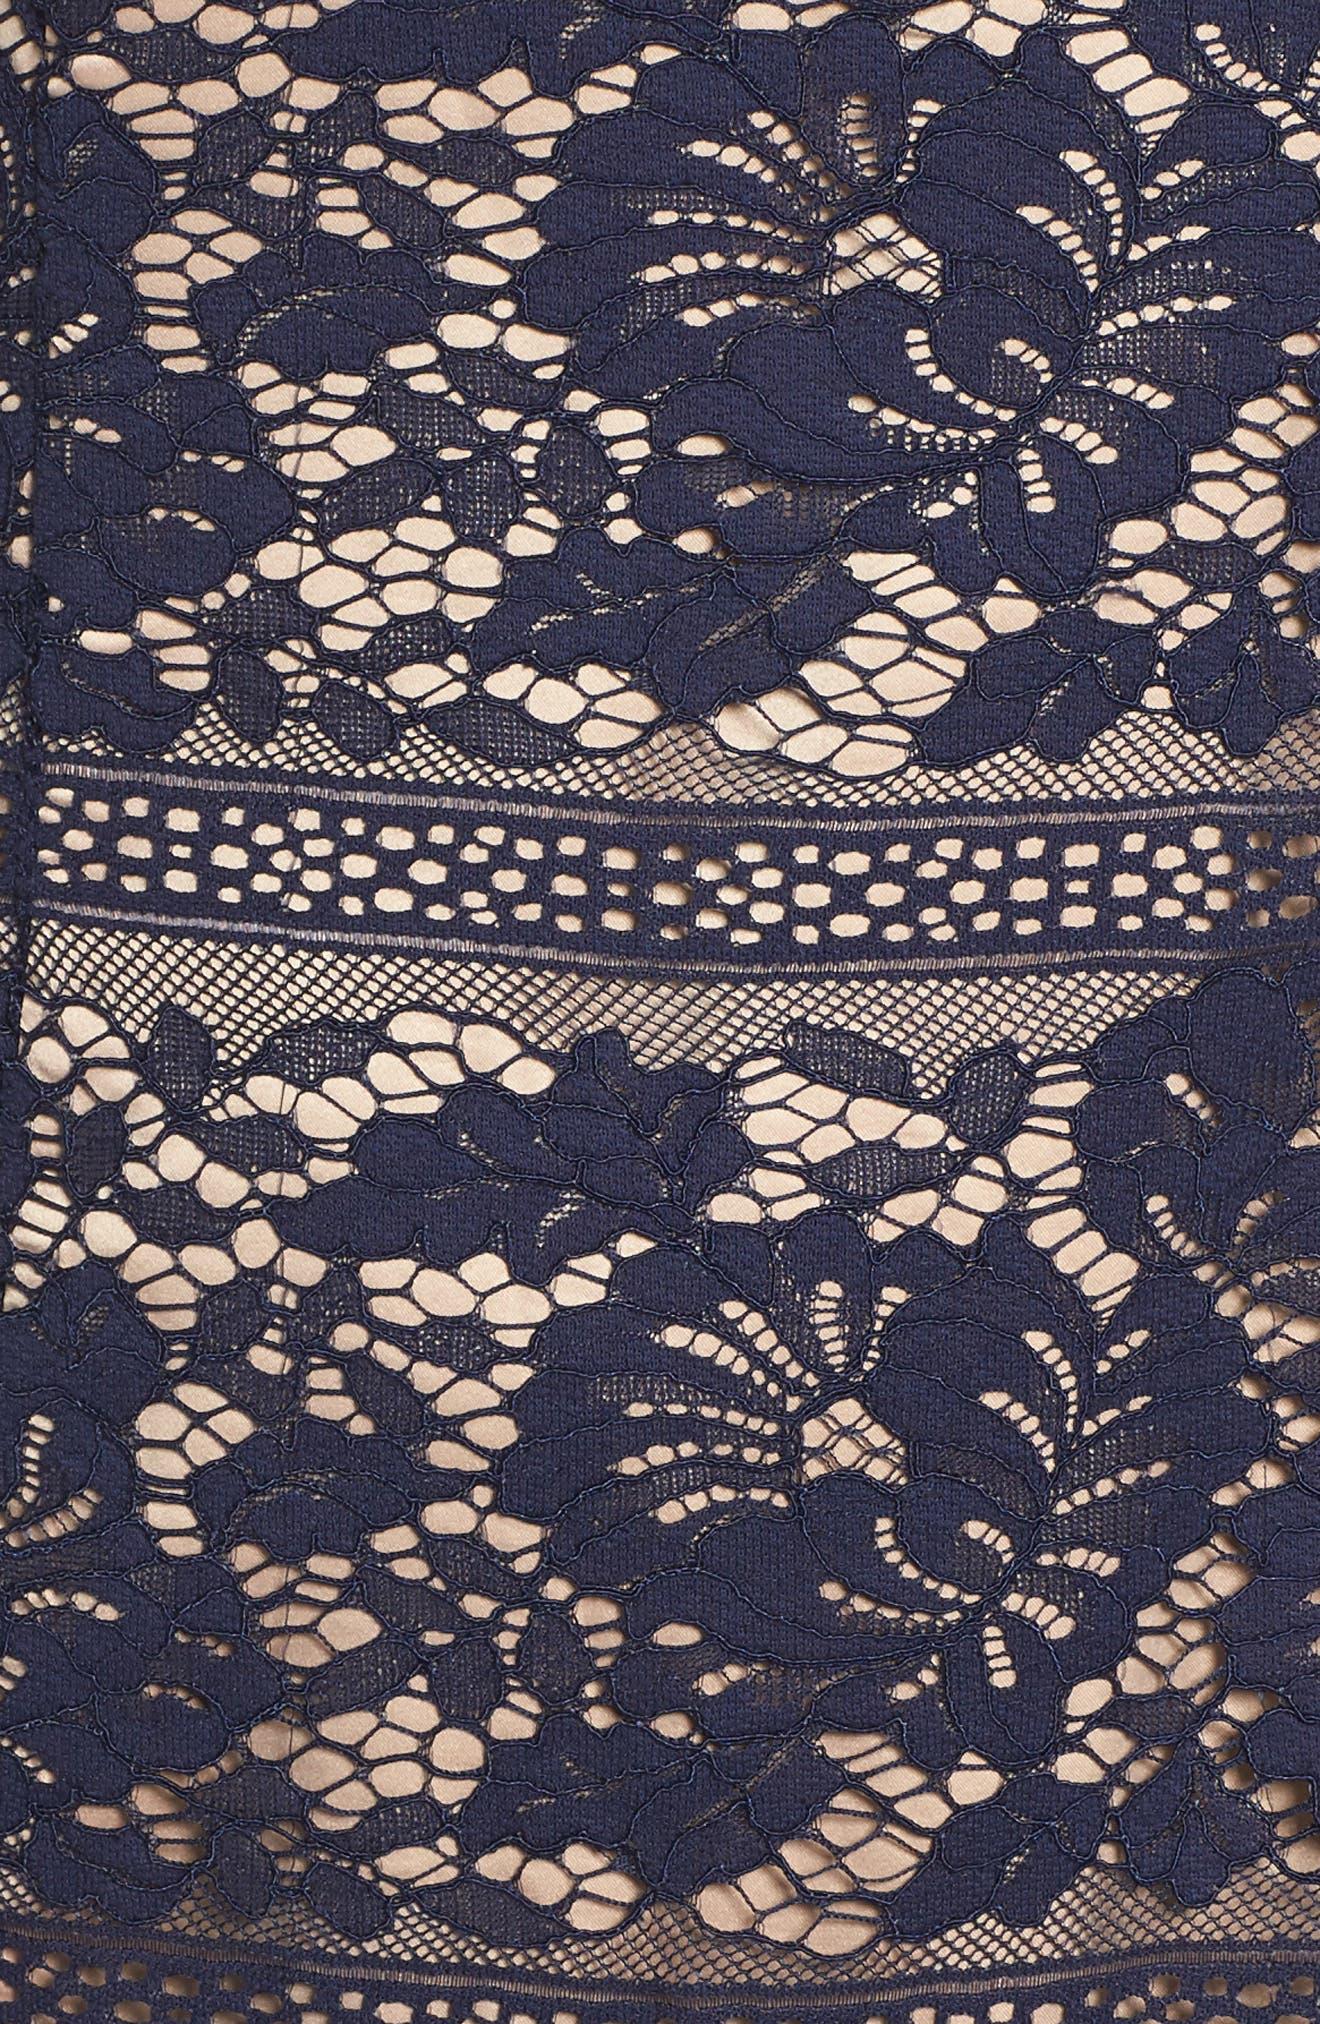 Lace Ruffle Hem Sheath Dress,                             Alternate thumbnail 5, color,                             Navy